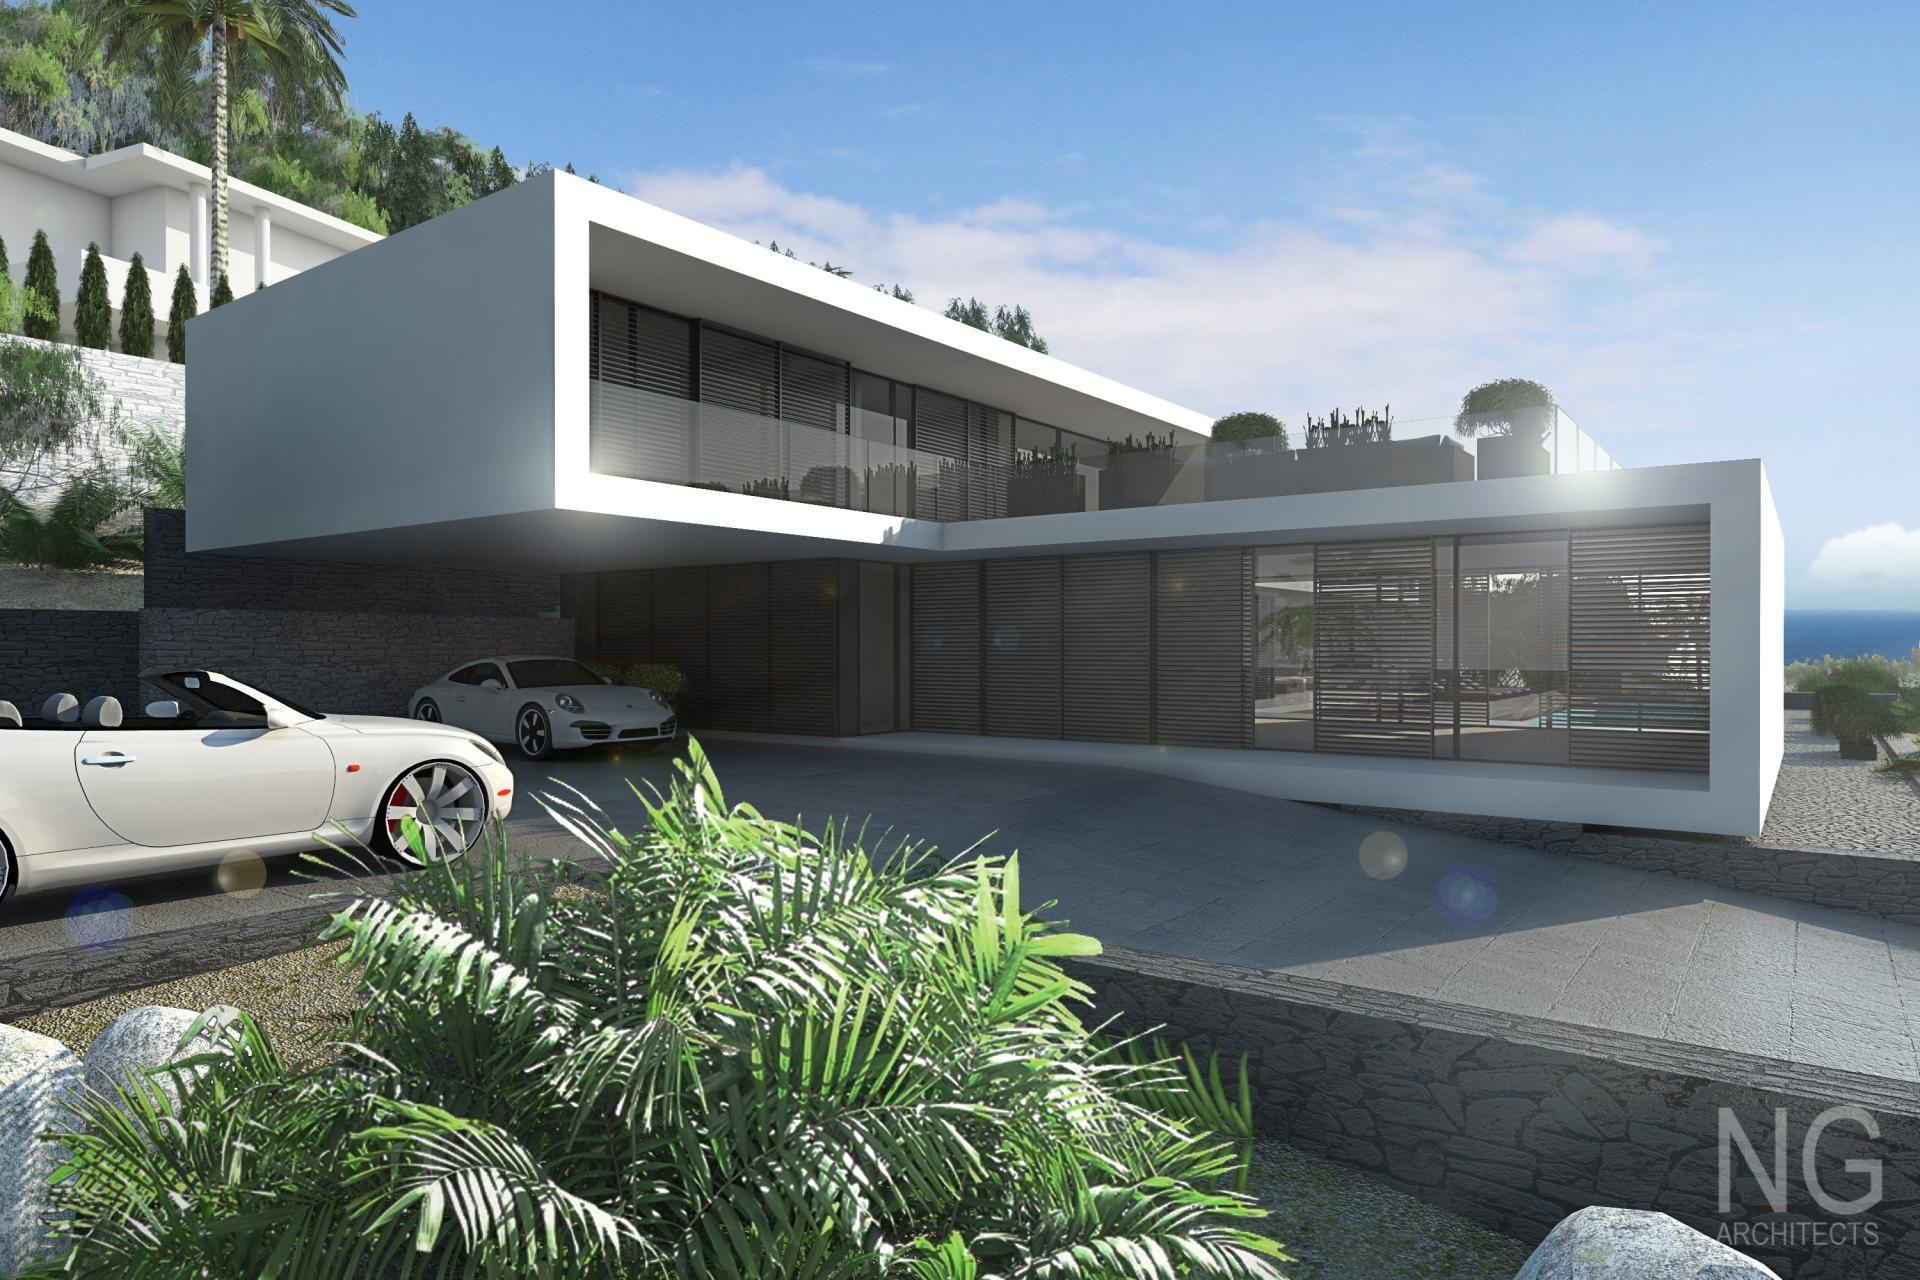 villa altea - ng architects | visual_arq_3d | artist´s_world, Innenarchitektur ideen